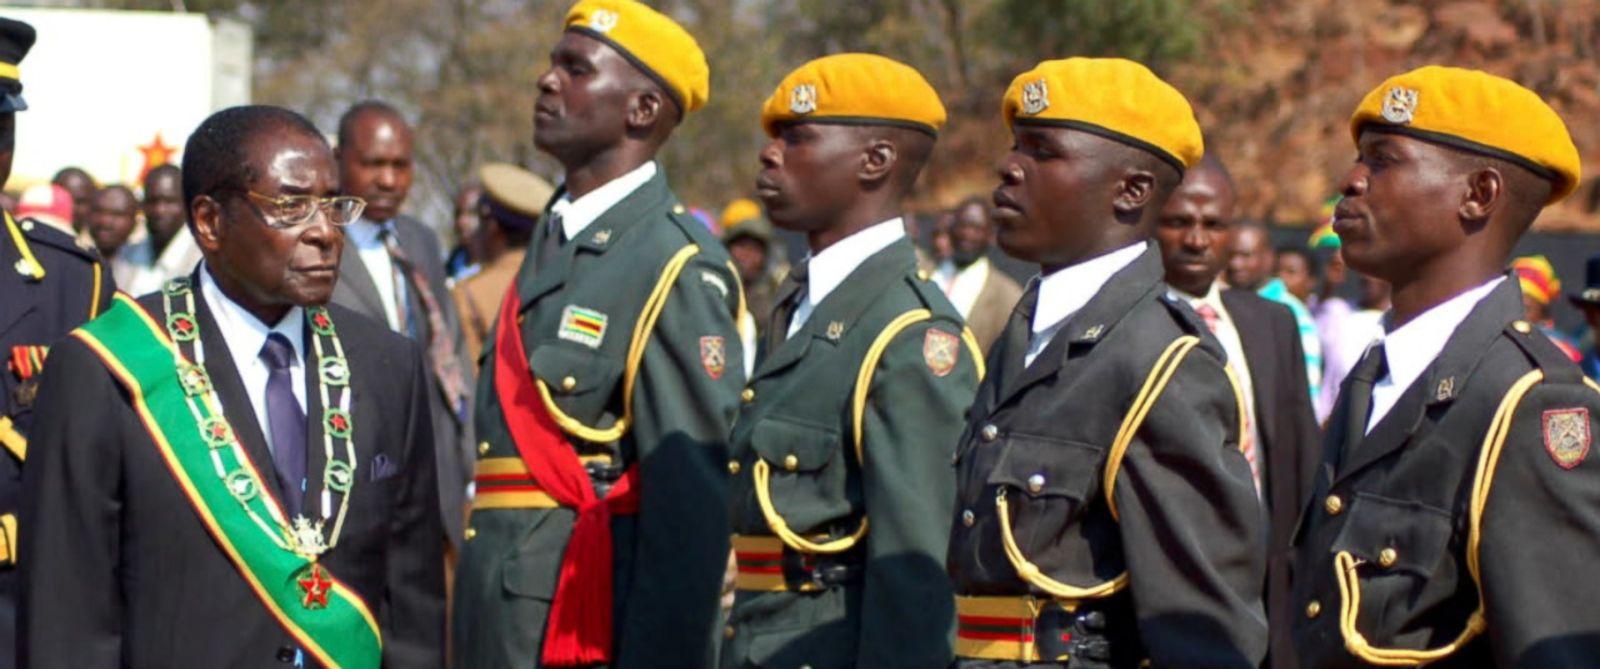 VIDEO: Who is Robert Mugabe?